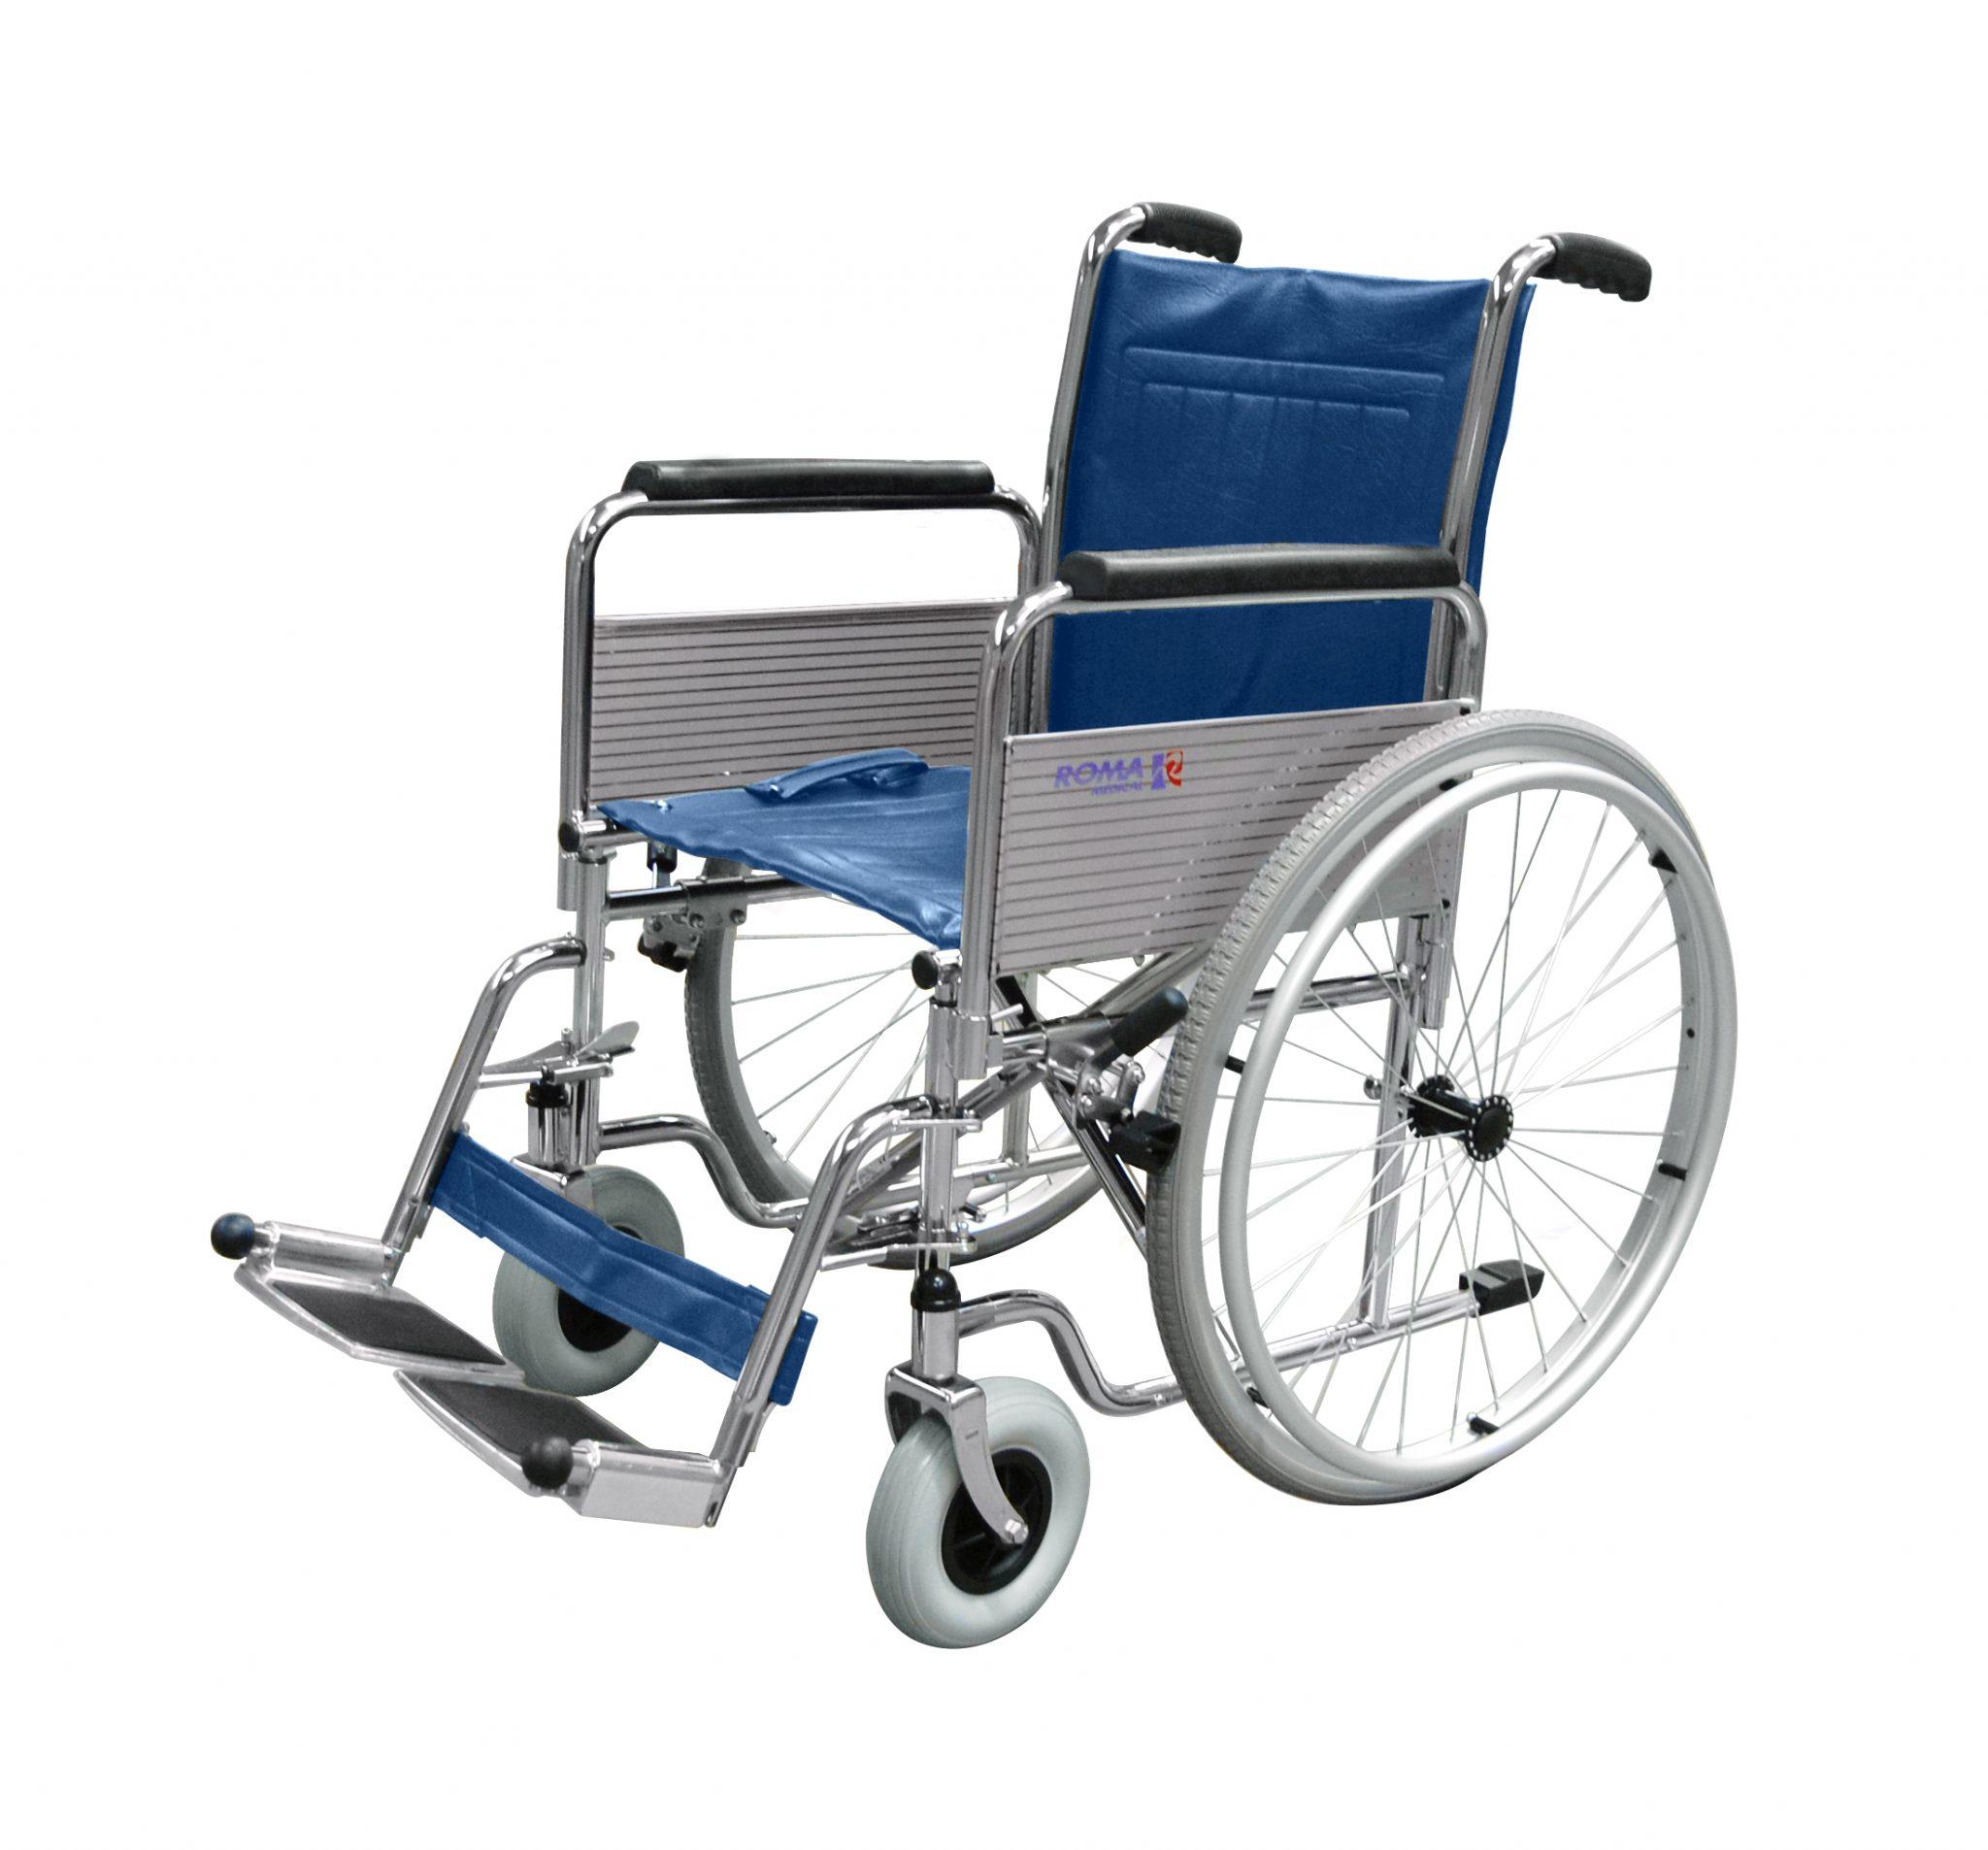 1410 Standard Self Propelled Wheelchair Roma Medical